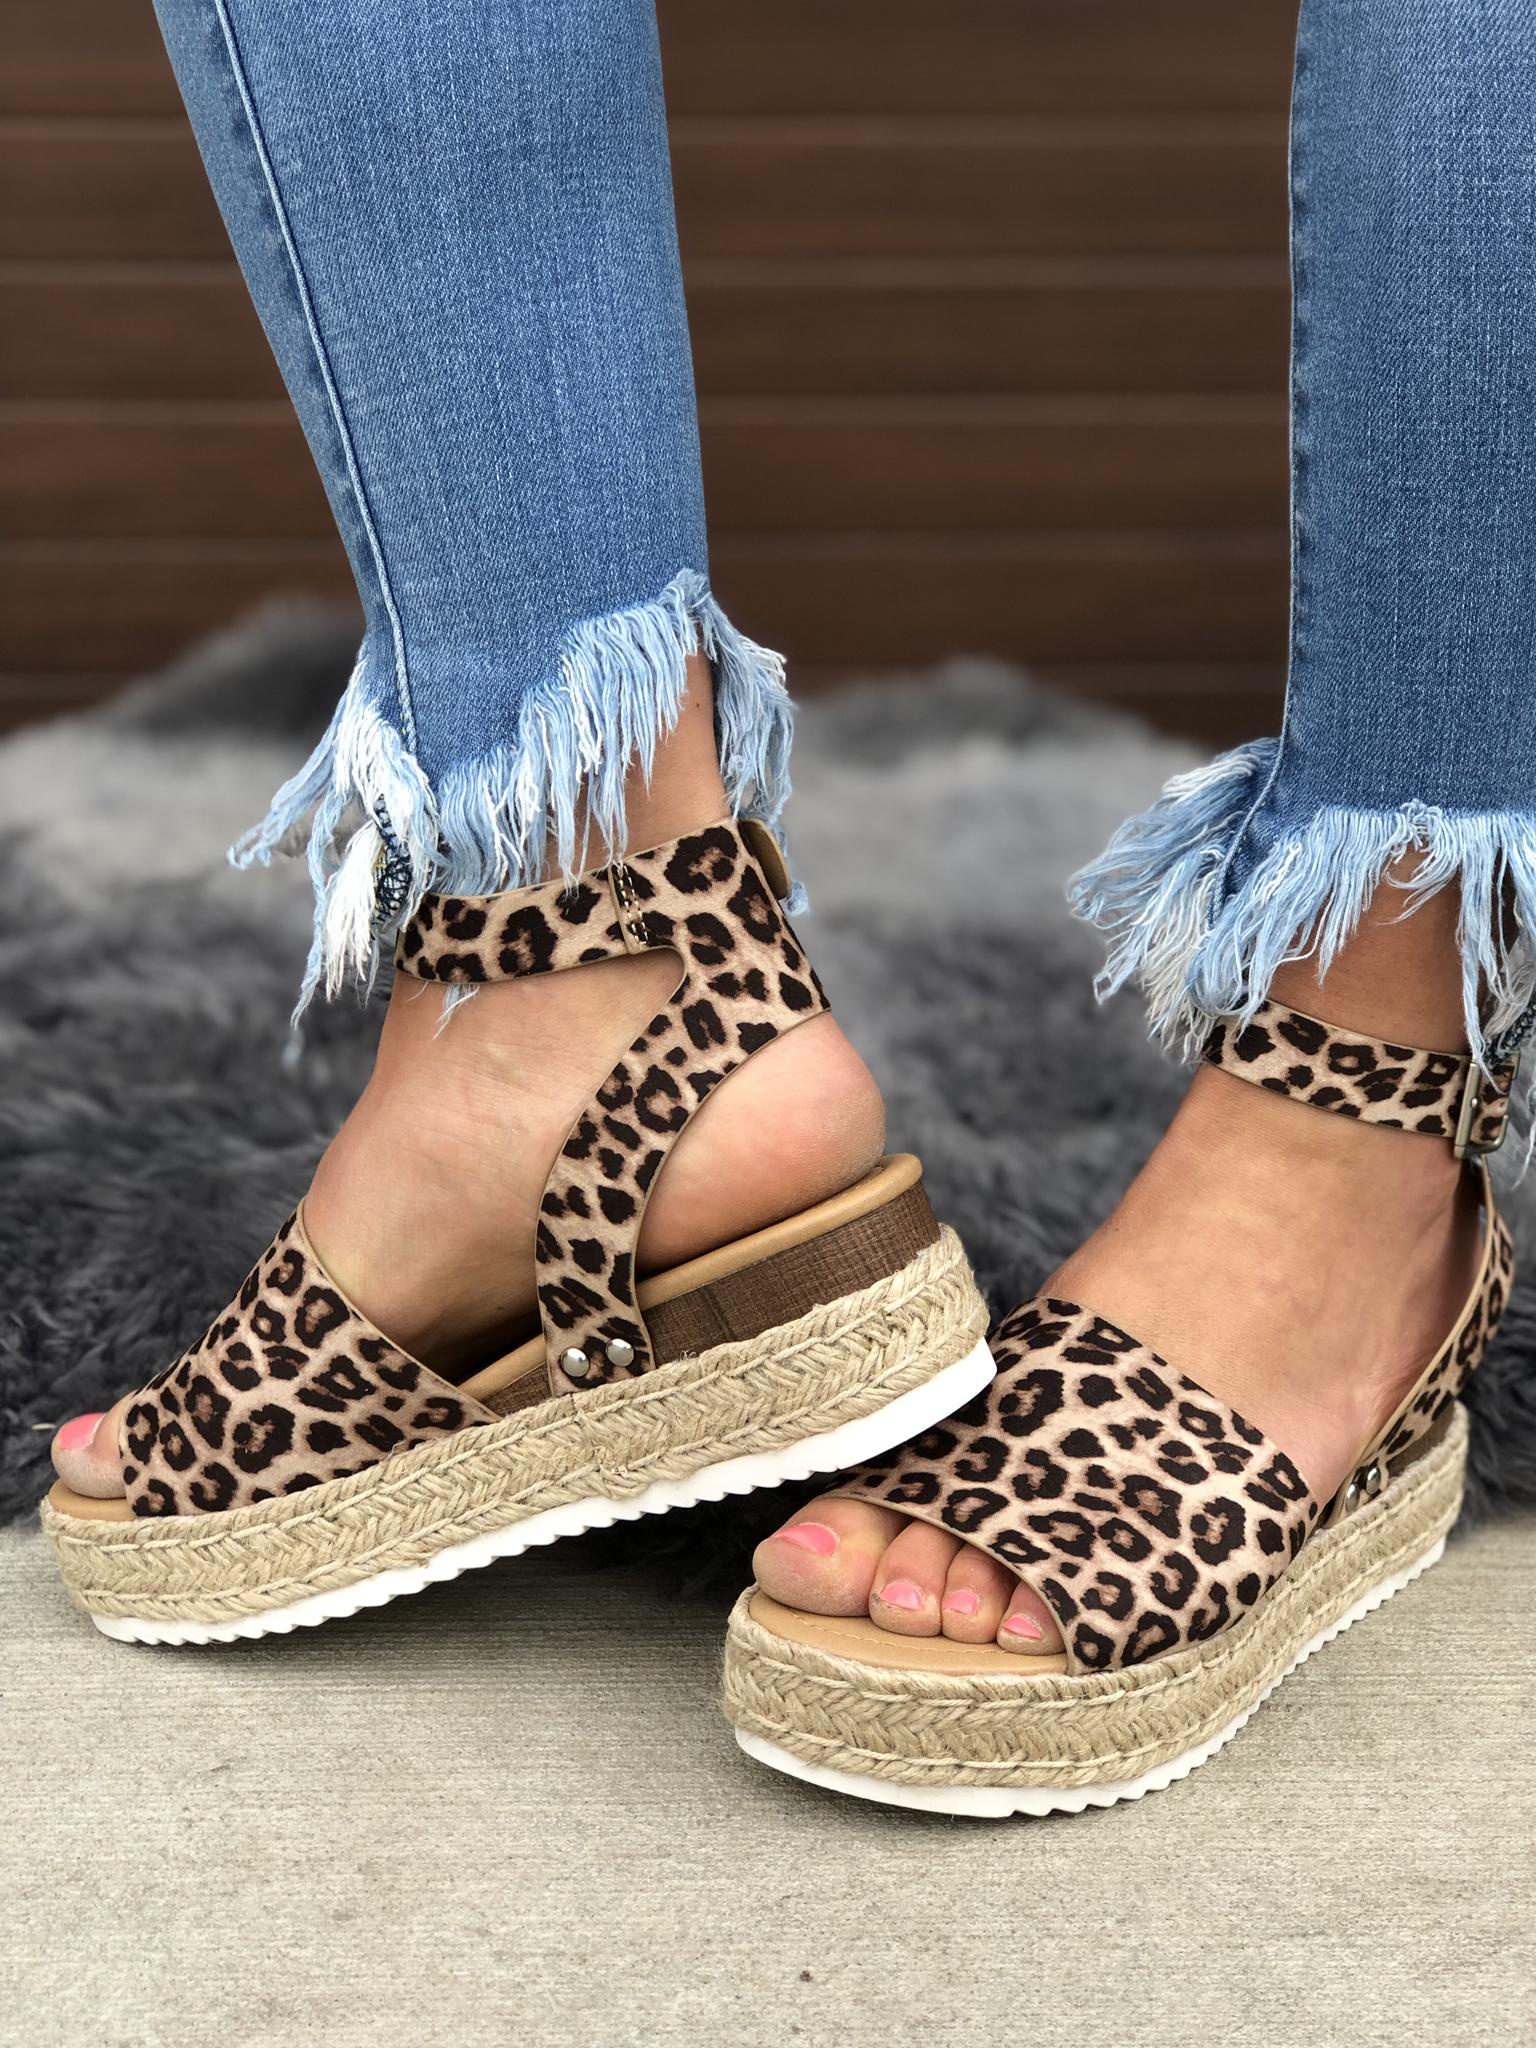 The Cheetah Platform Sandal - 6.5 LEFT! 82382